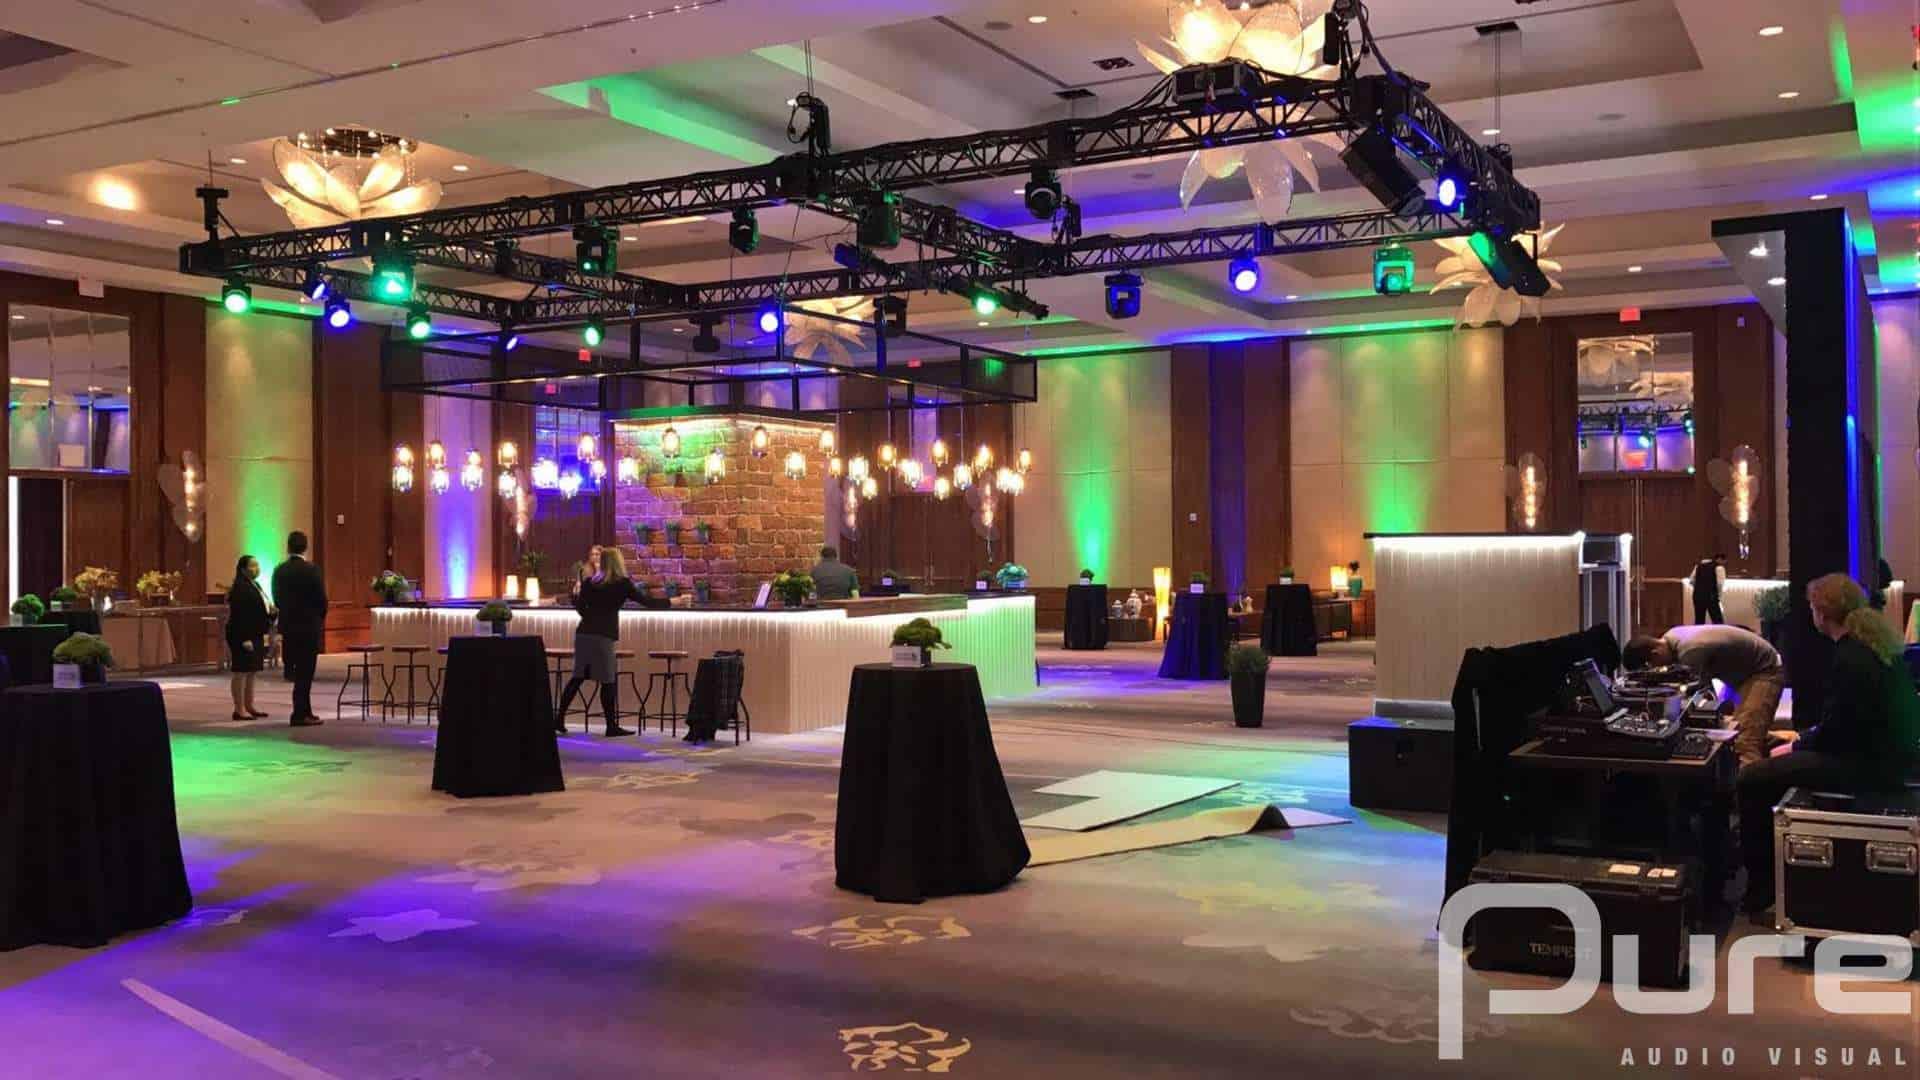 Corporate Event, Lighting, AV, Audio Visual, Truss, Moving Heads, Uplights